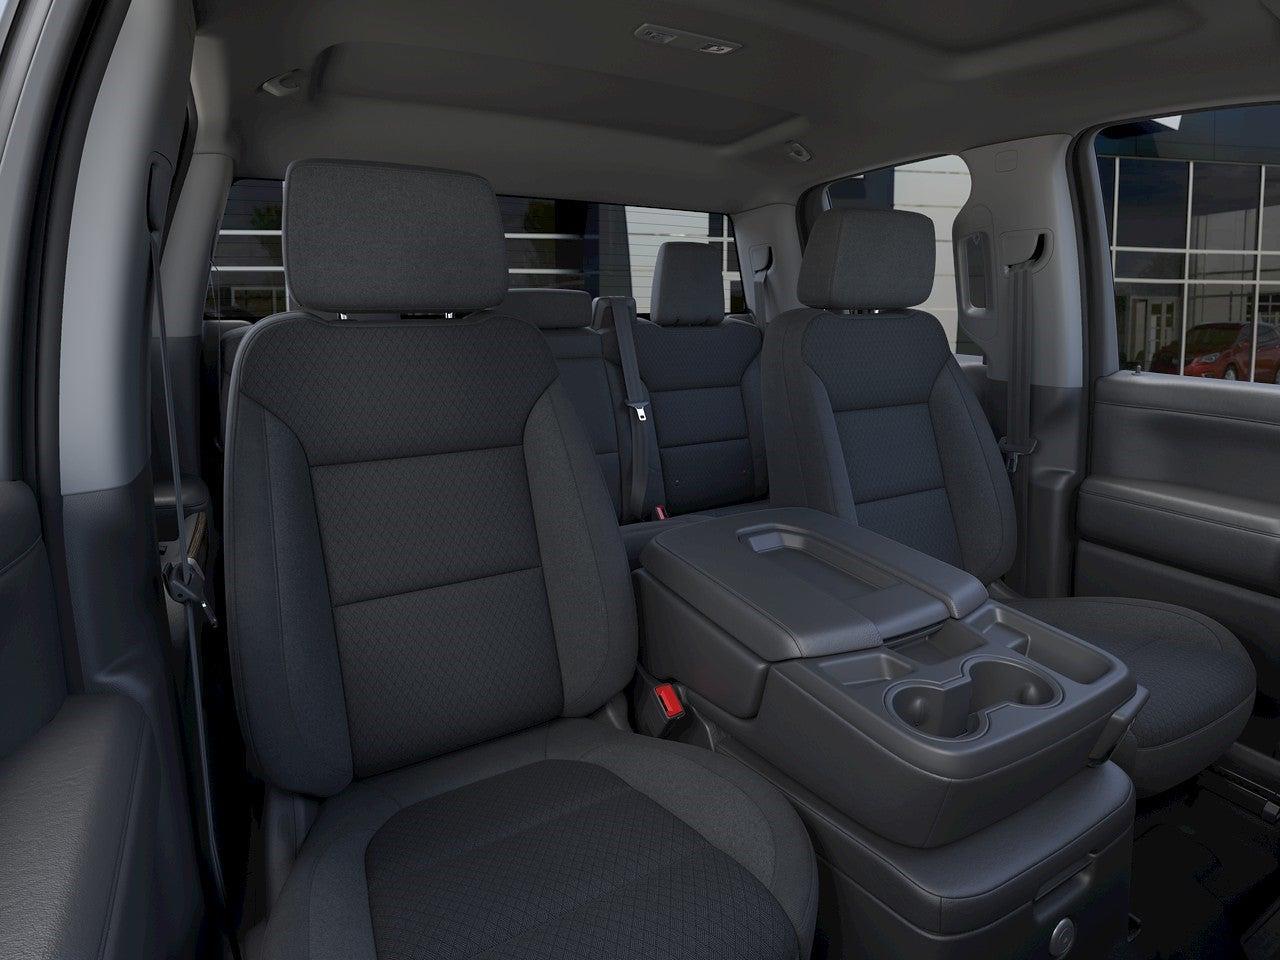 2021 GMC Sierra 1500 Double Cab 4x4, Pickup #V21172 - photo 13